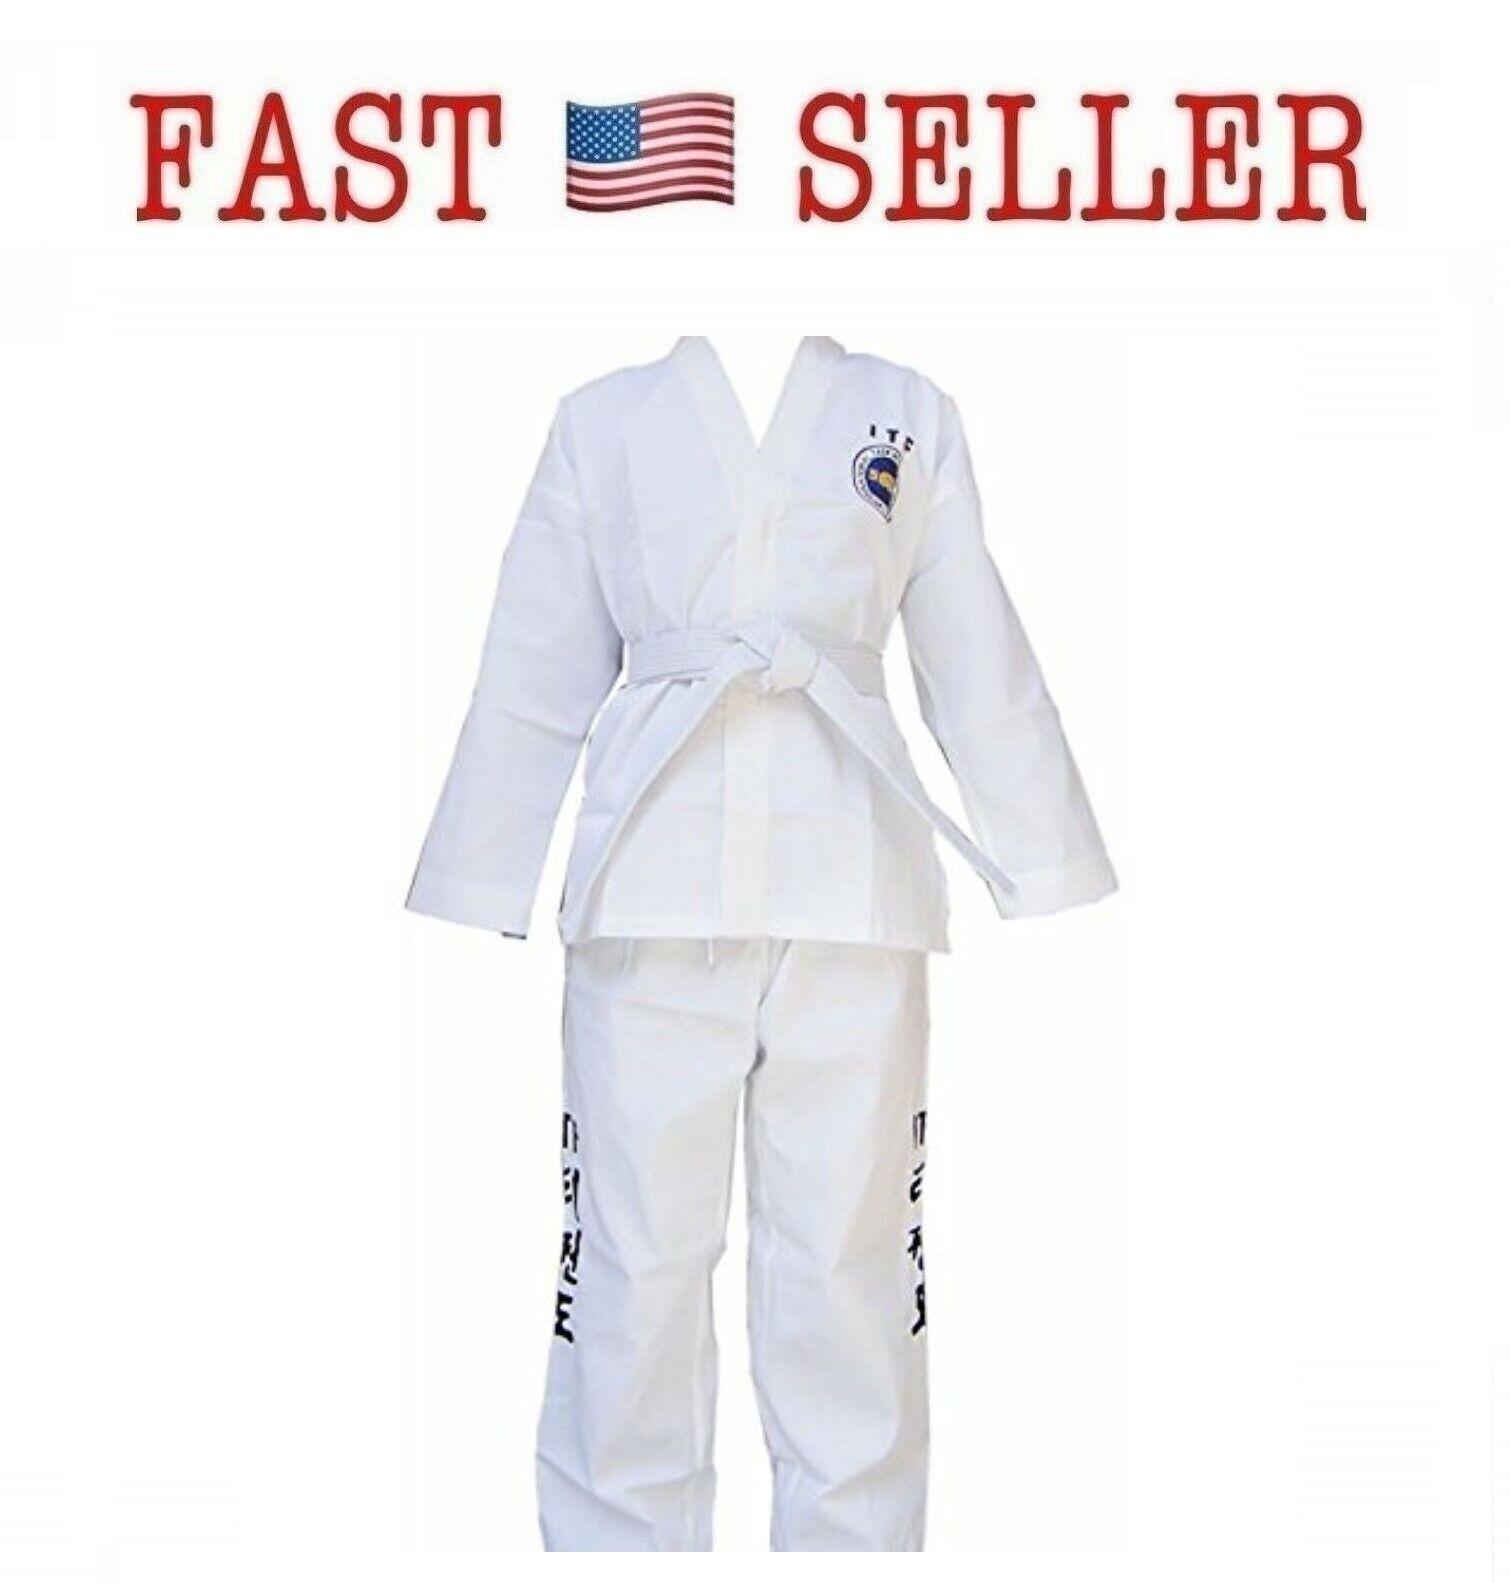 7.5 Oz ITF Taekwondo Karate Uniform White (Small) -  NEW - FAST   sale online